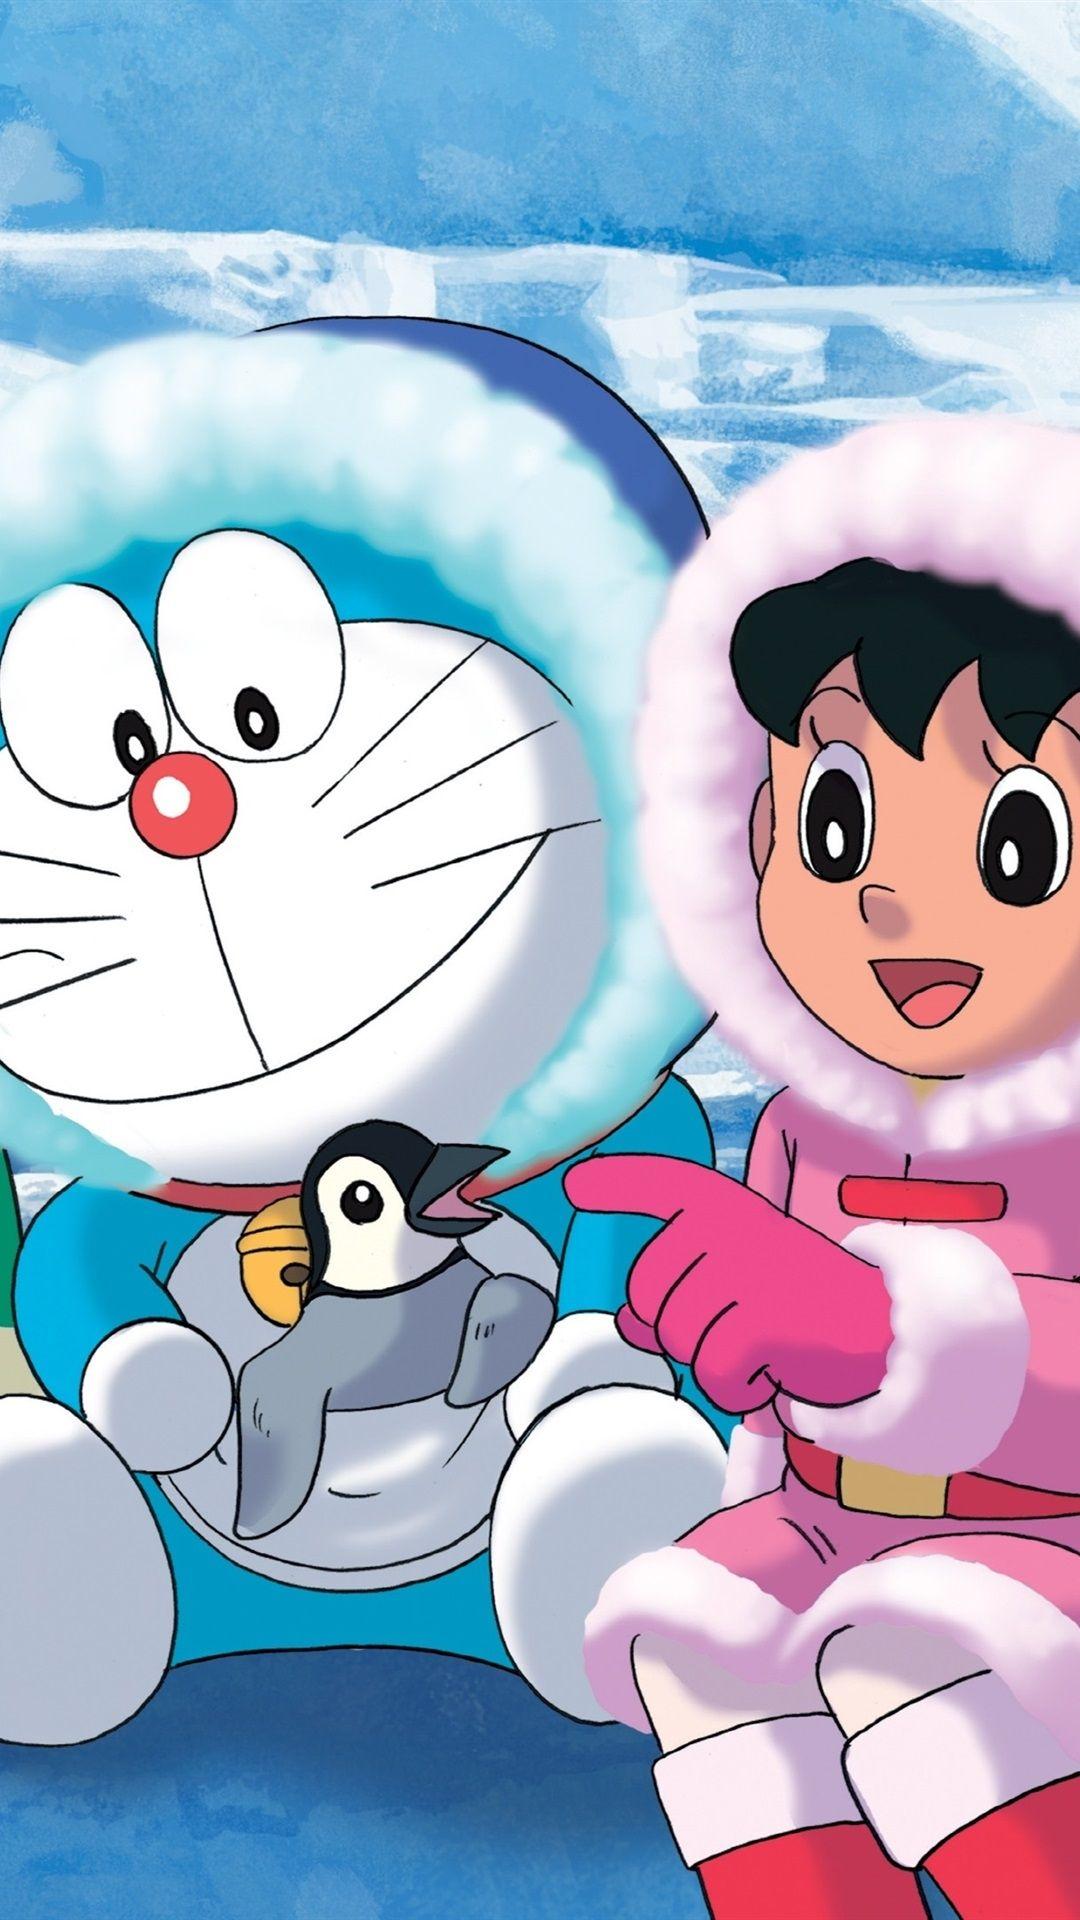 Doraemon Wallpaper Hd Android Hd Wallpapers Backgrounds With Regard To The Most Awesome Doraemon Wallpaper For Ph Di 2020 Kartun Latar Belakang Animasi Ilustrasi Komik